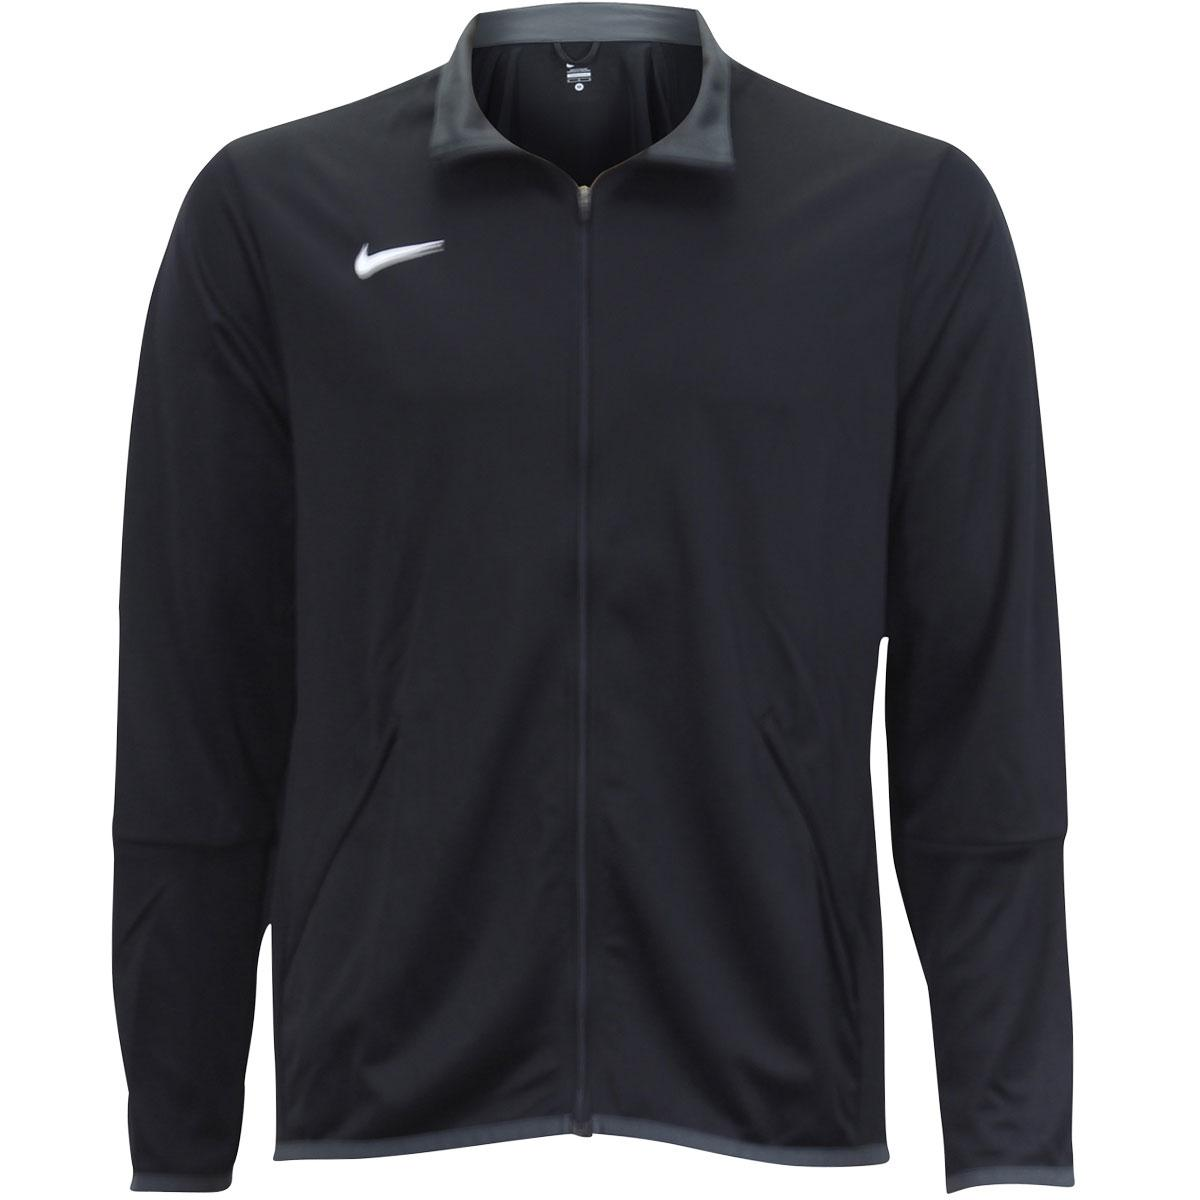 Nike Men's Mesh Stripe Long Sleeve Athletic Training Jacket